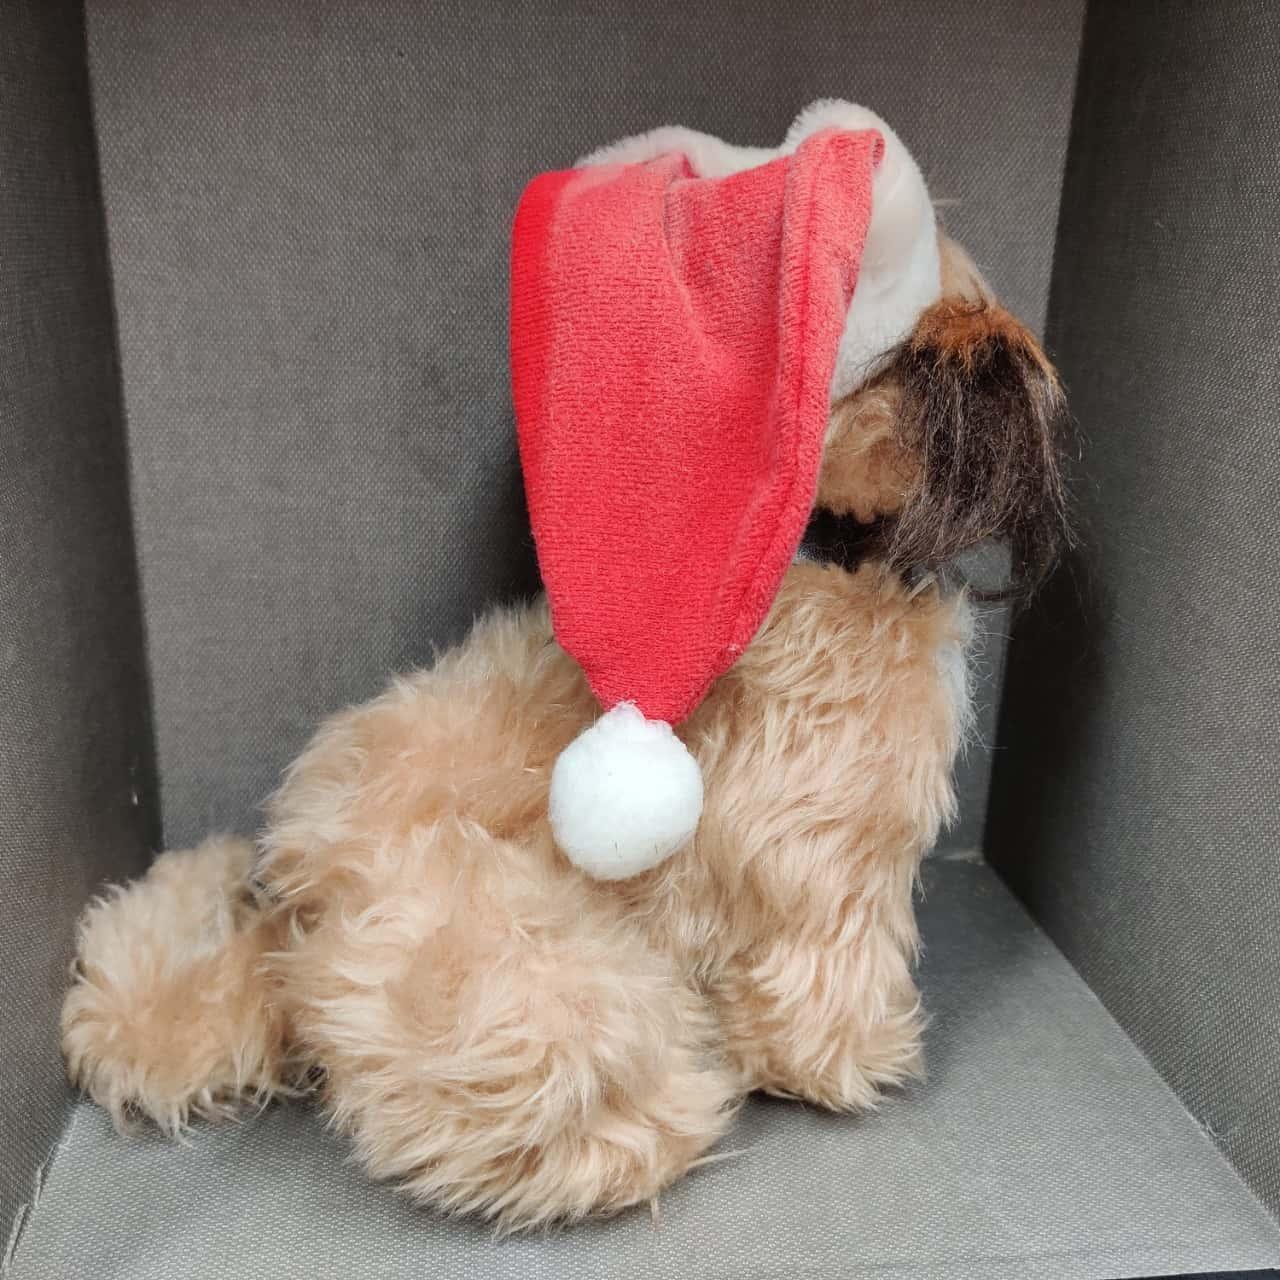 Benji The Dog with Christmas Hat